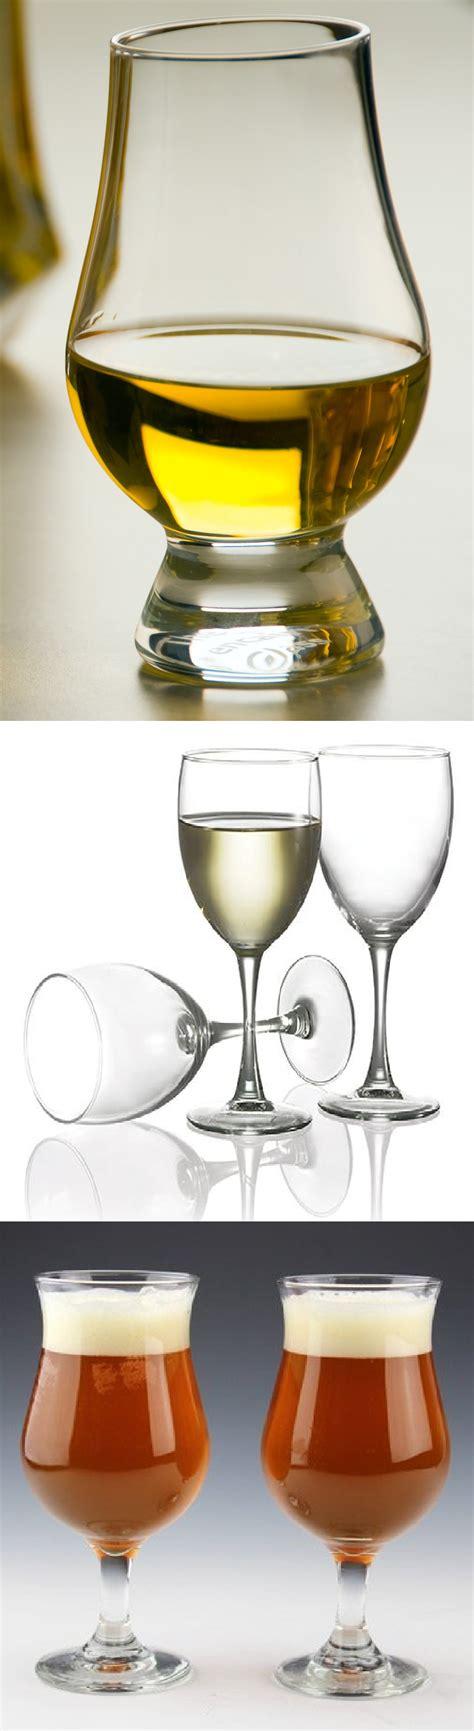 Best Barware Shaker, Glasses, Displays  Examined Living